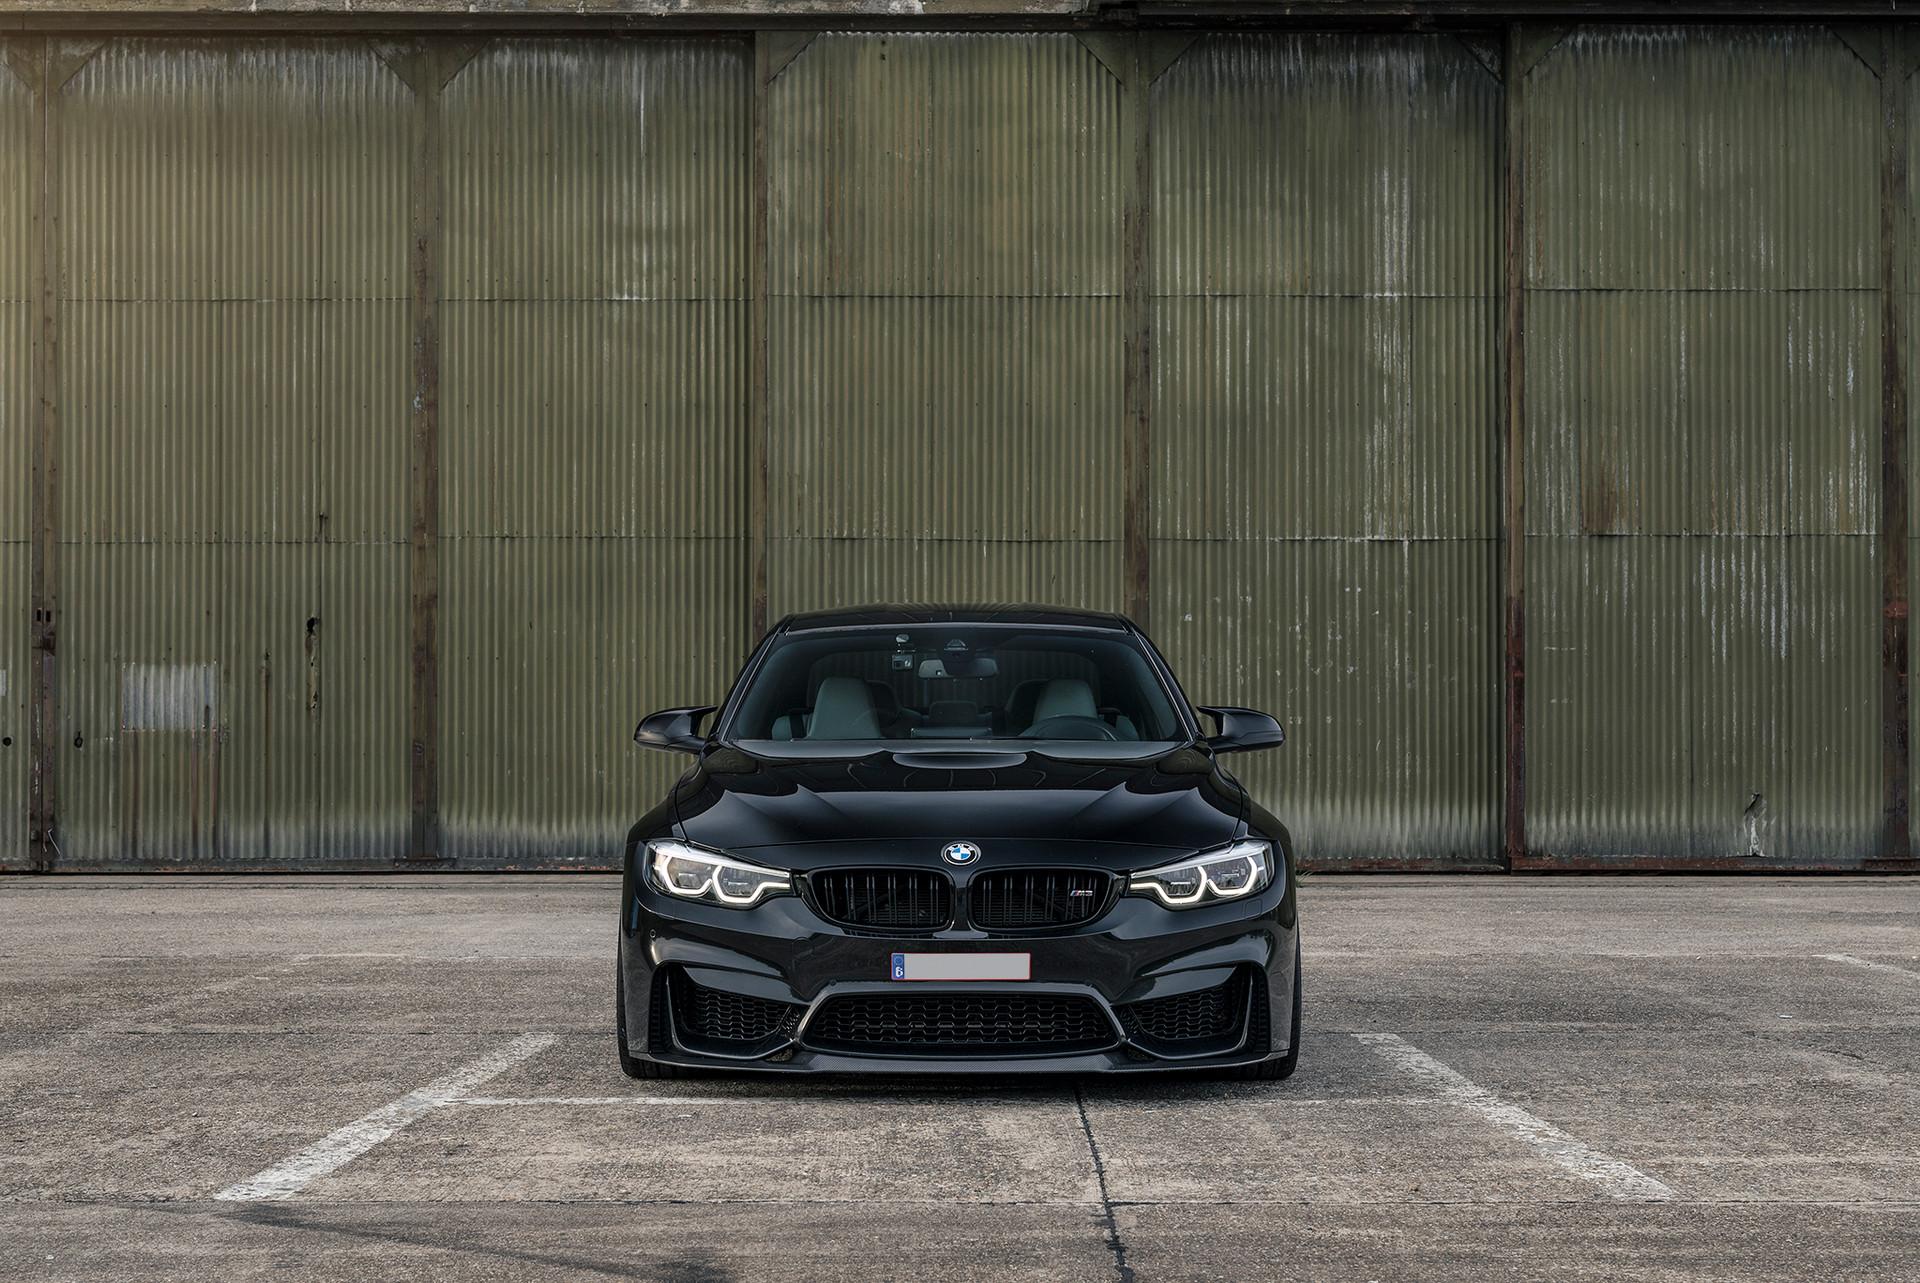 BMW F80 Tuned